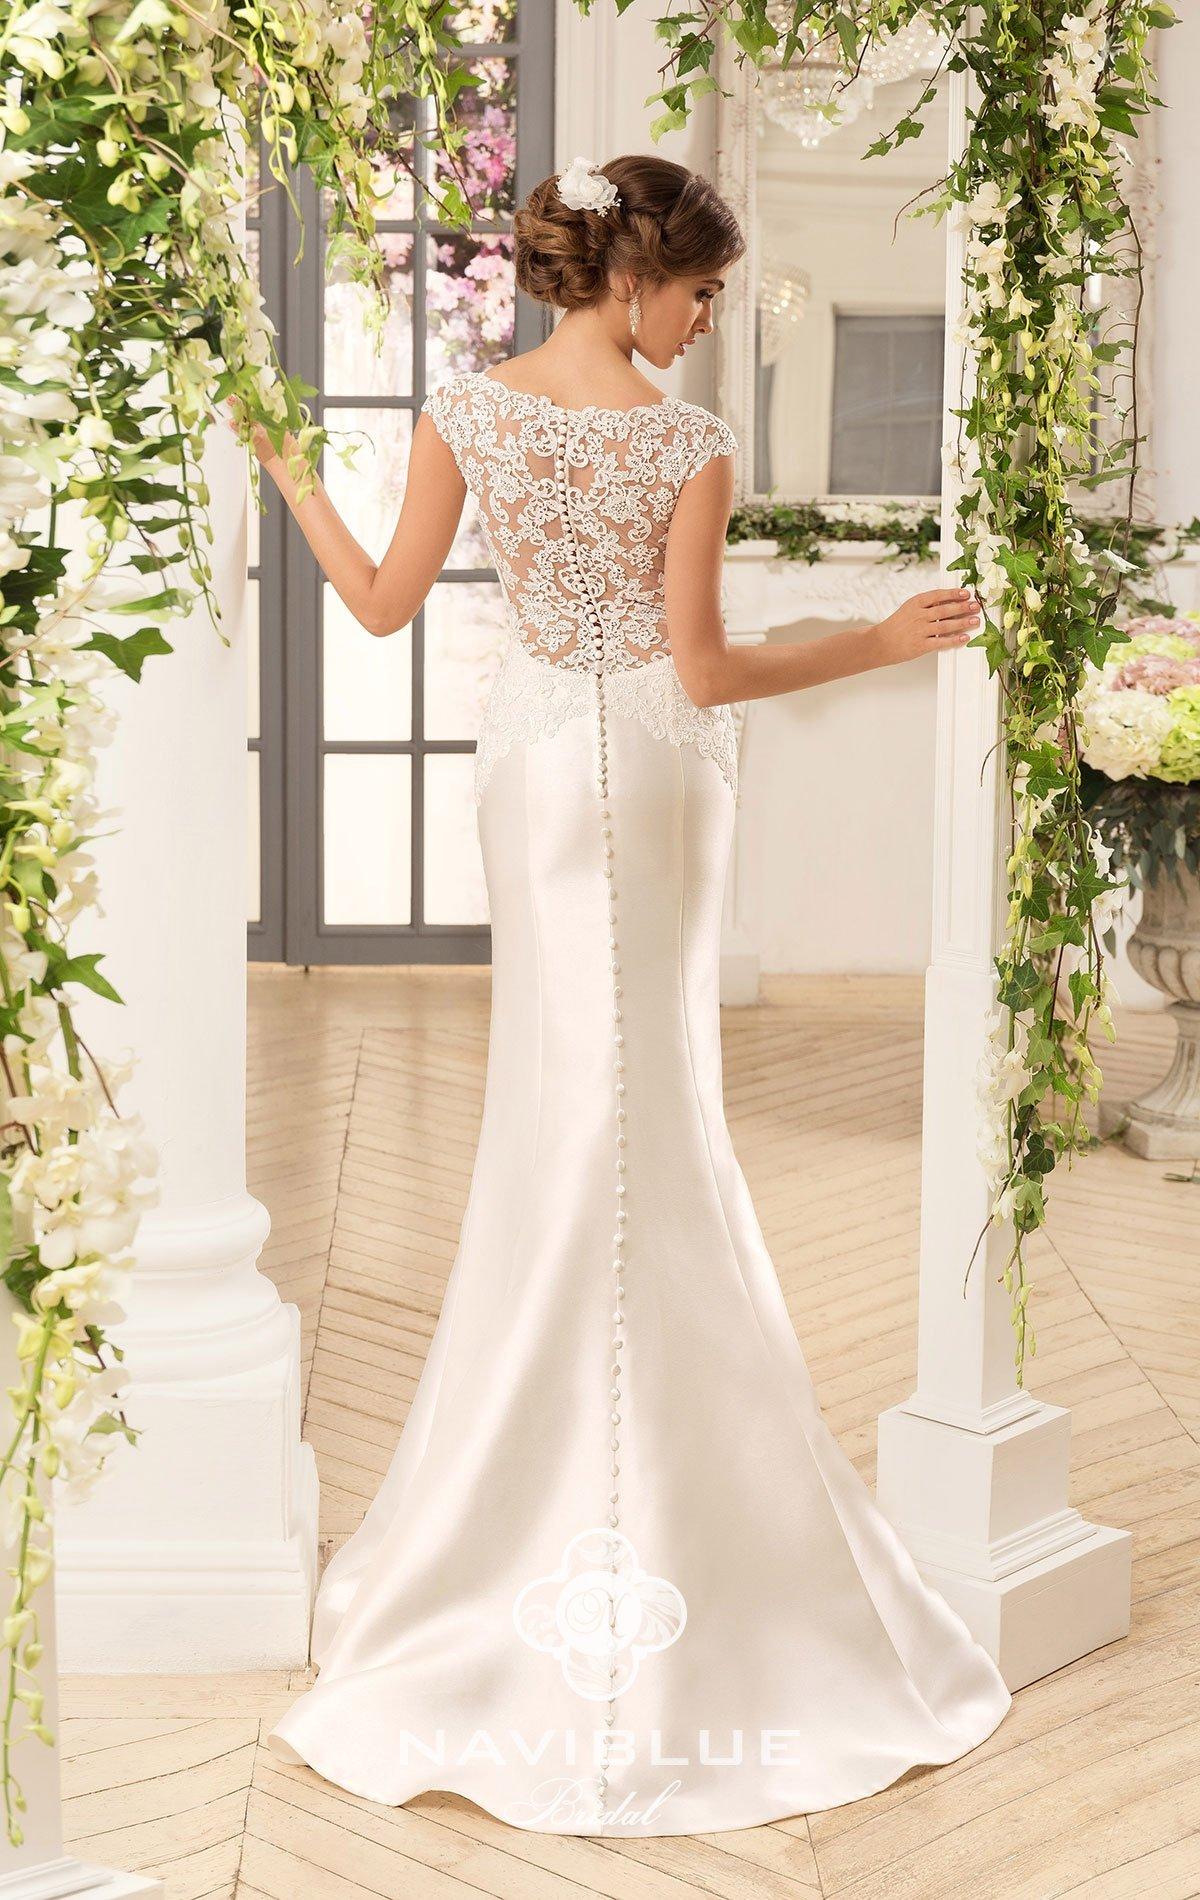 full_Kristiana-_15355_valentinos bridal ohio.jpg